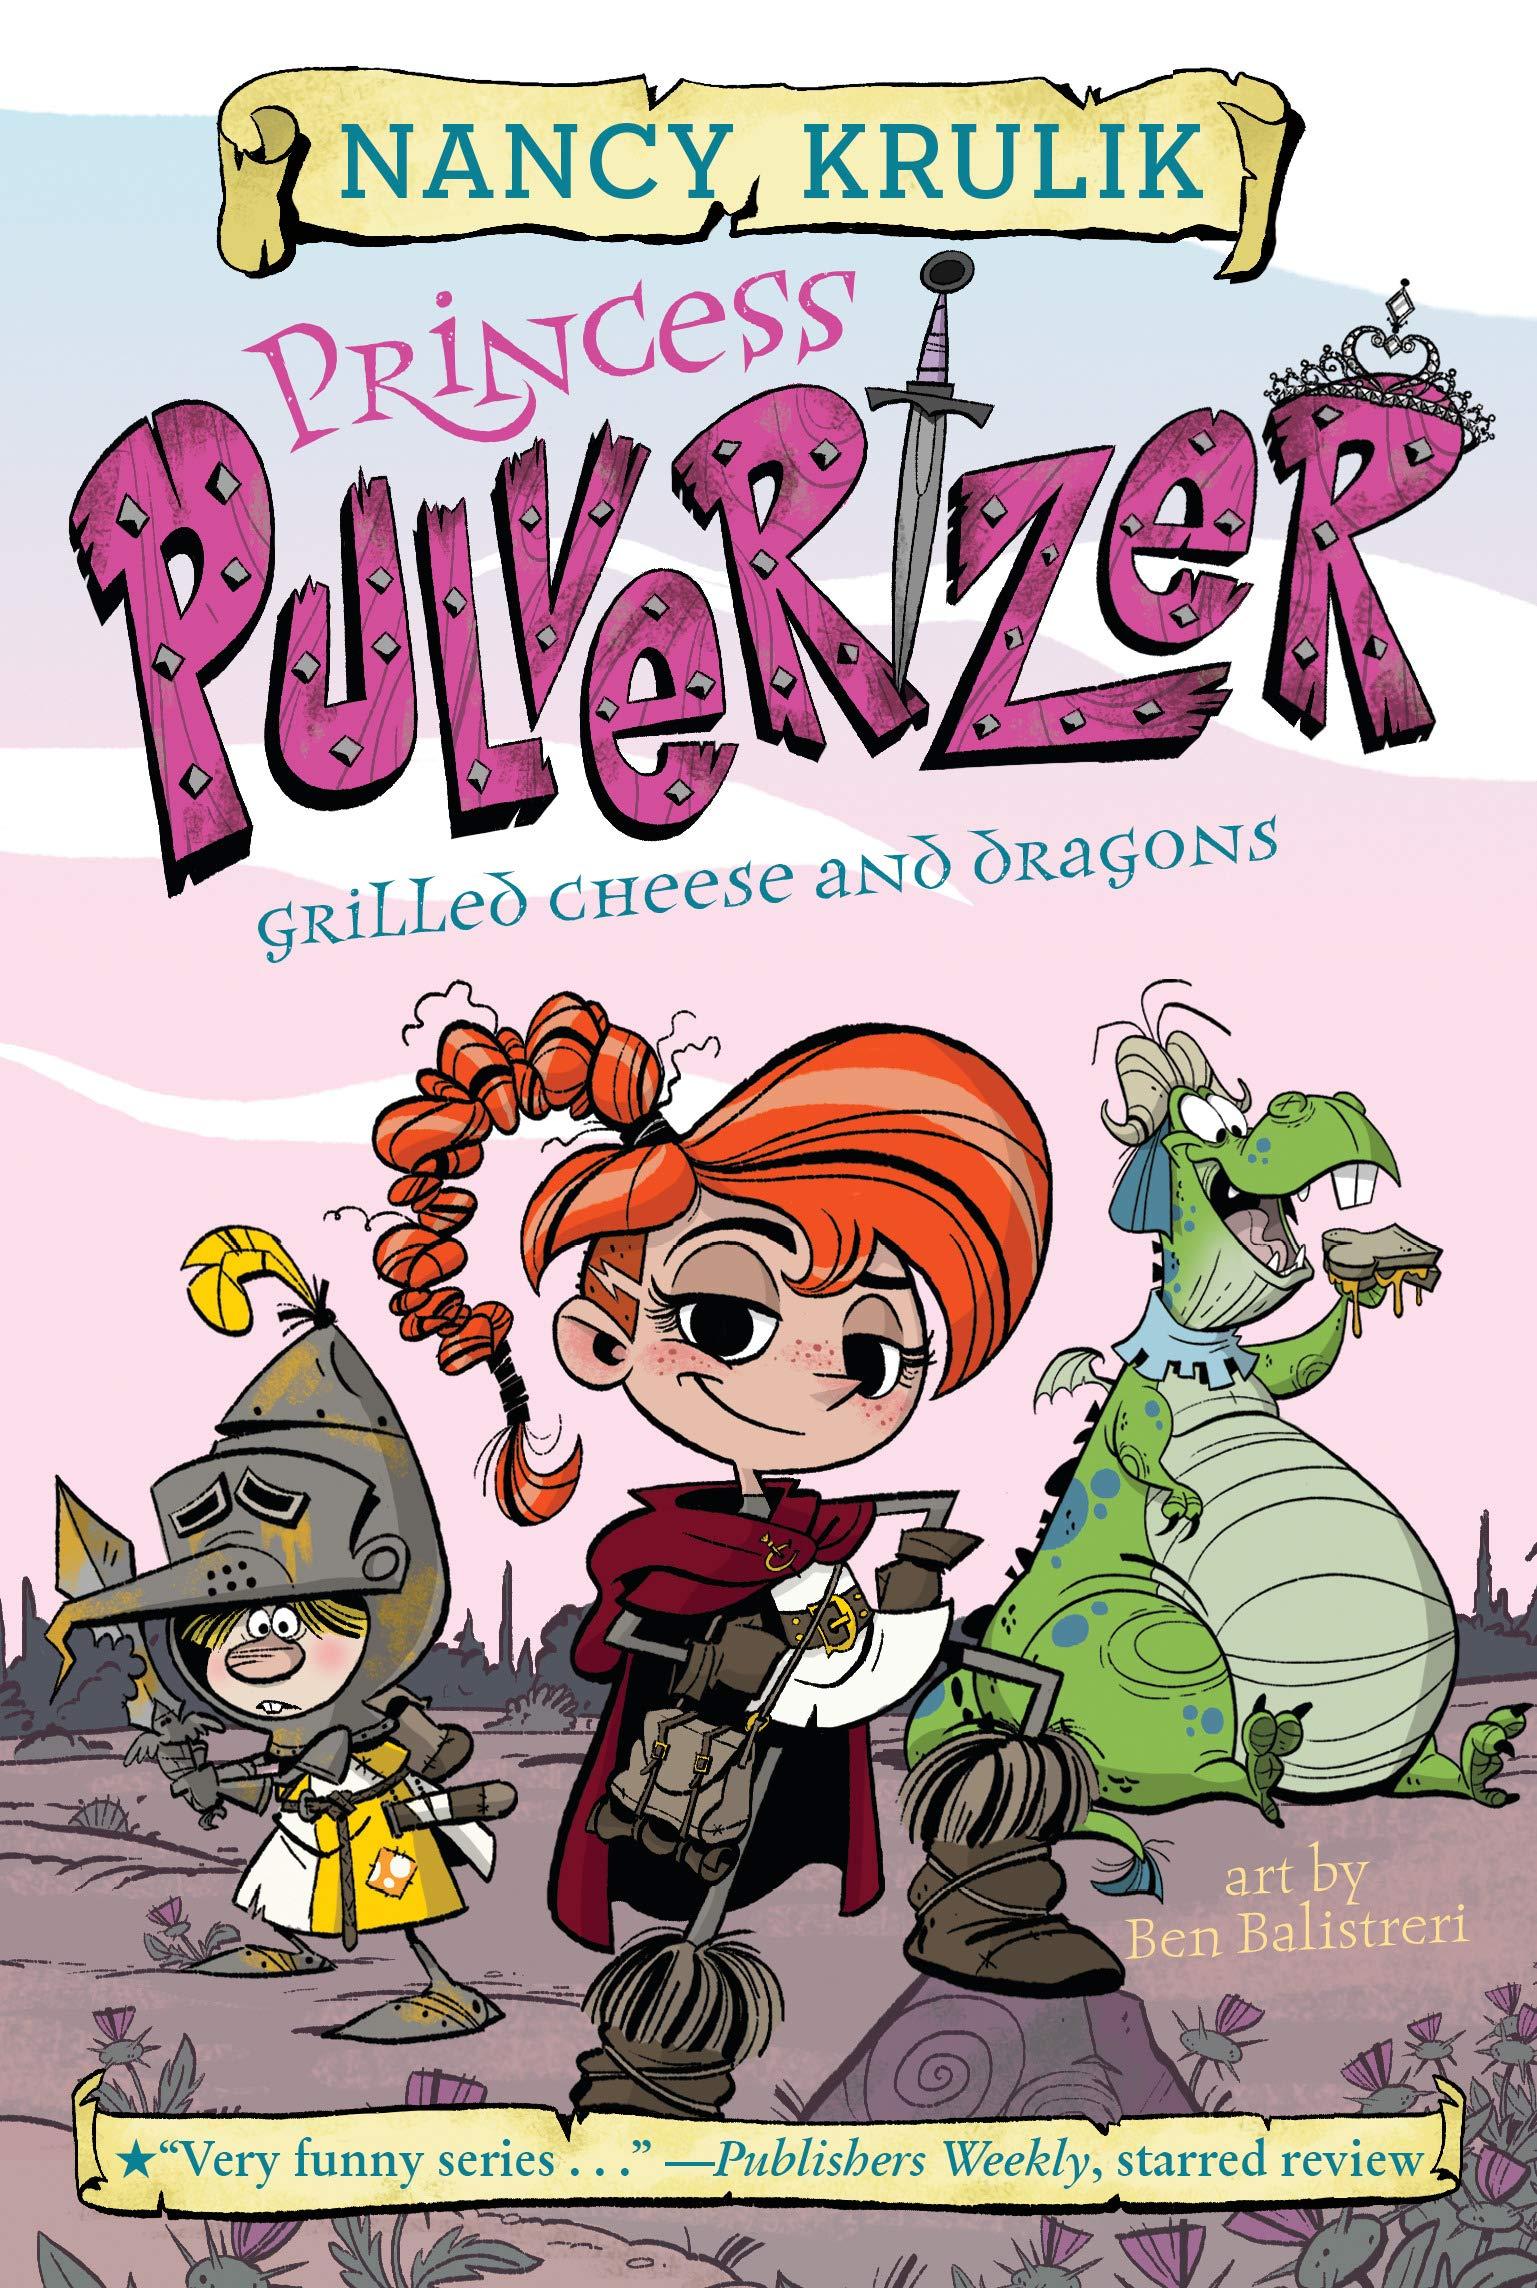 Amazon.com: Grilled Cheese and Dragons #1 (Princess Pulverizer) (9780515158311): Krulik, Nancy, Balistreri, Ben: Books